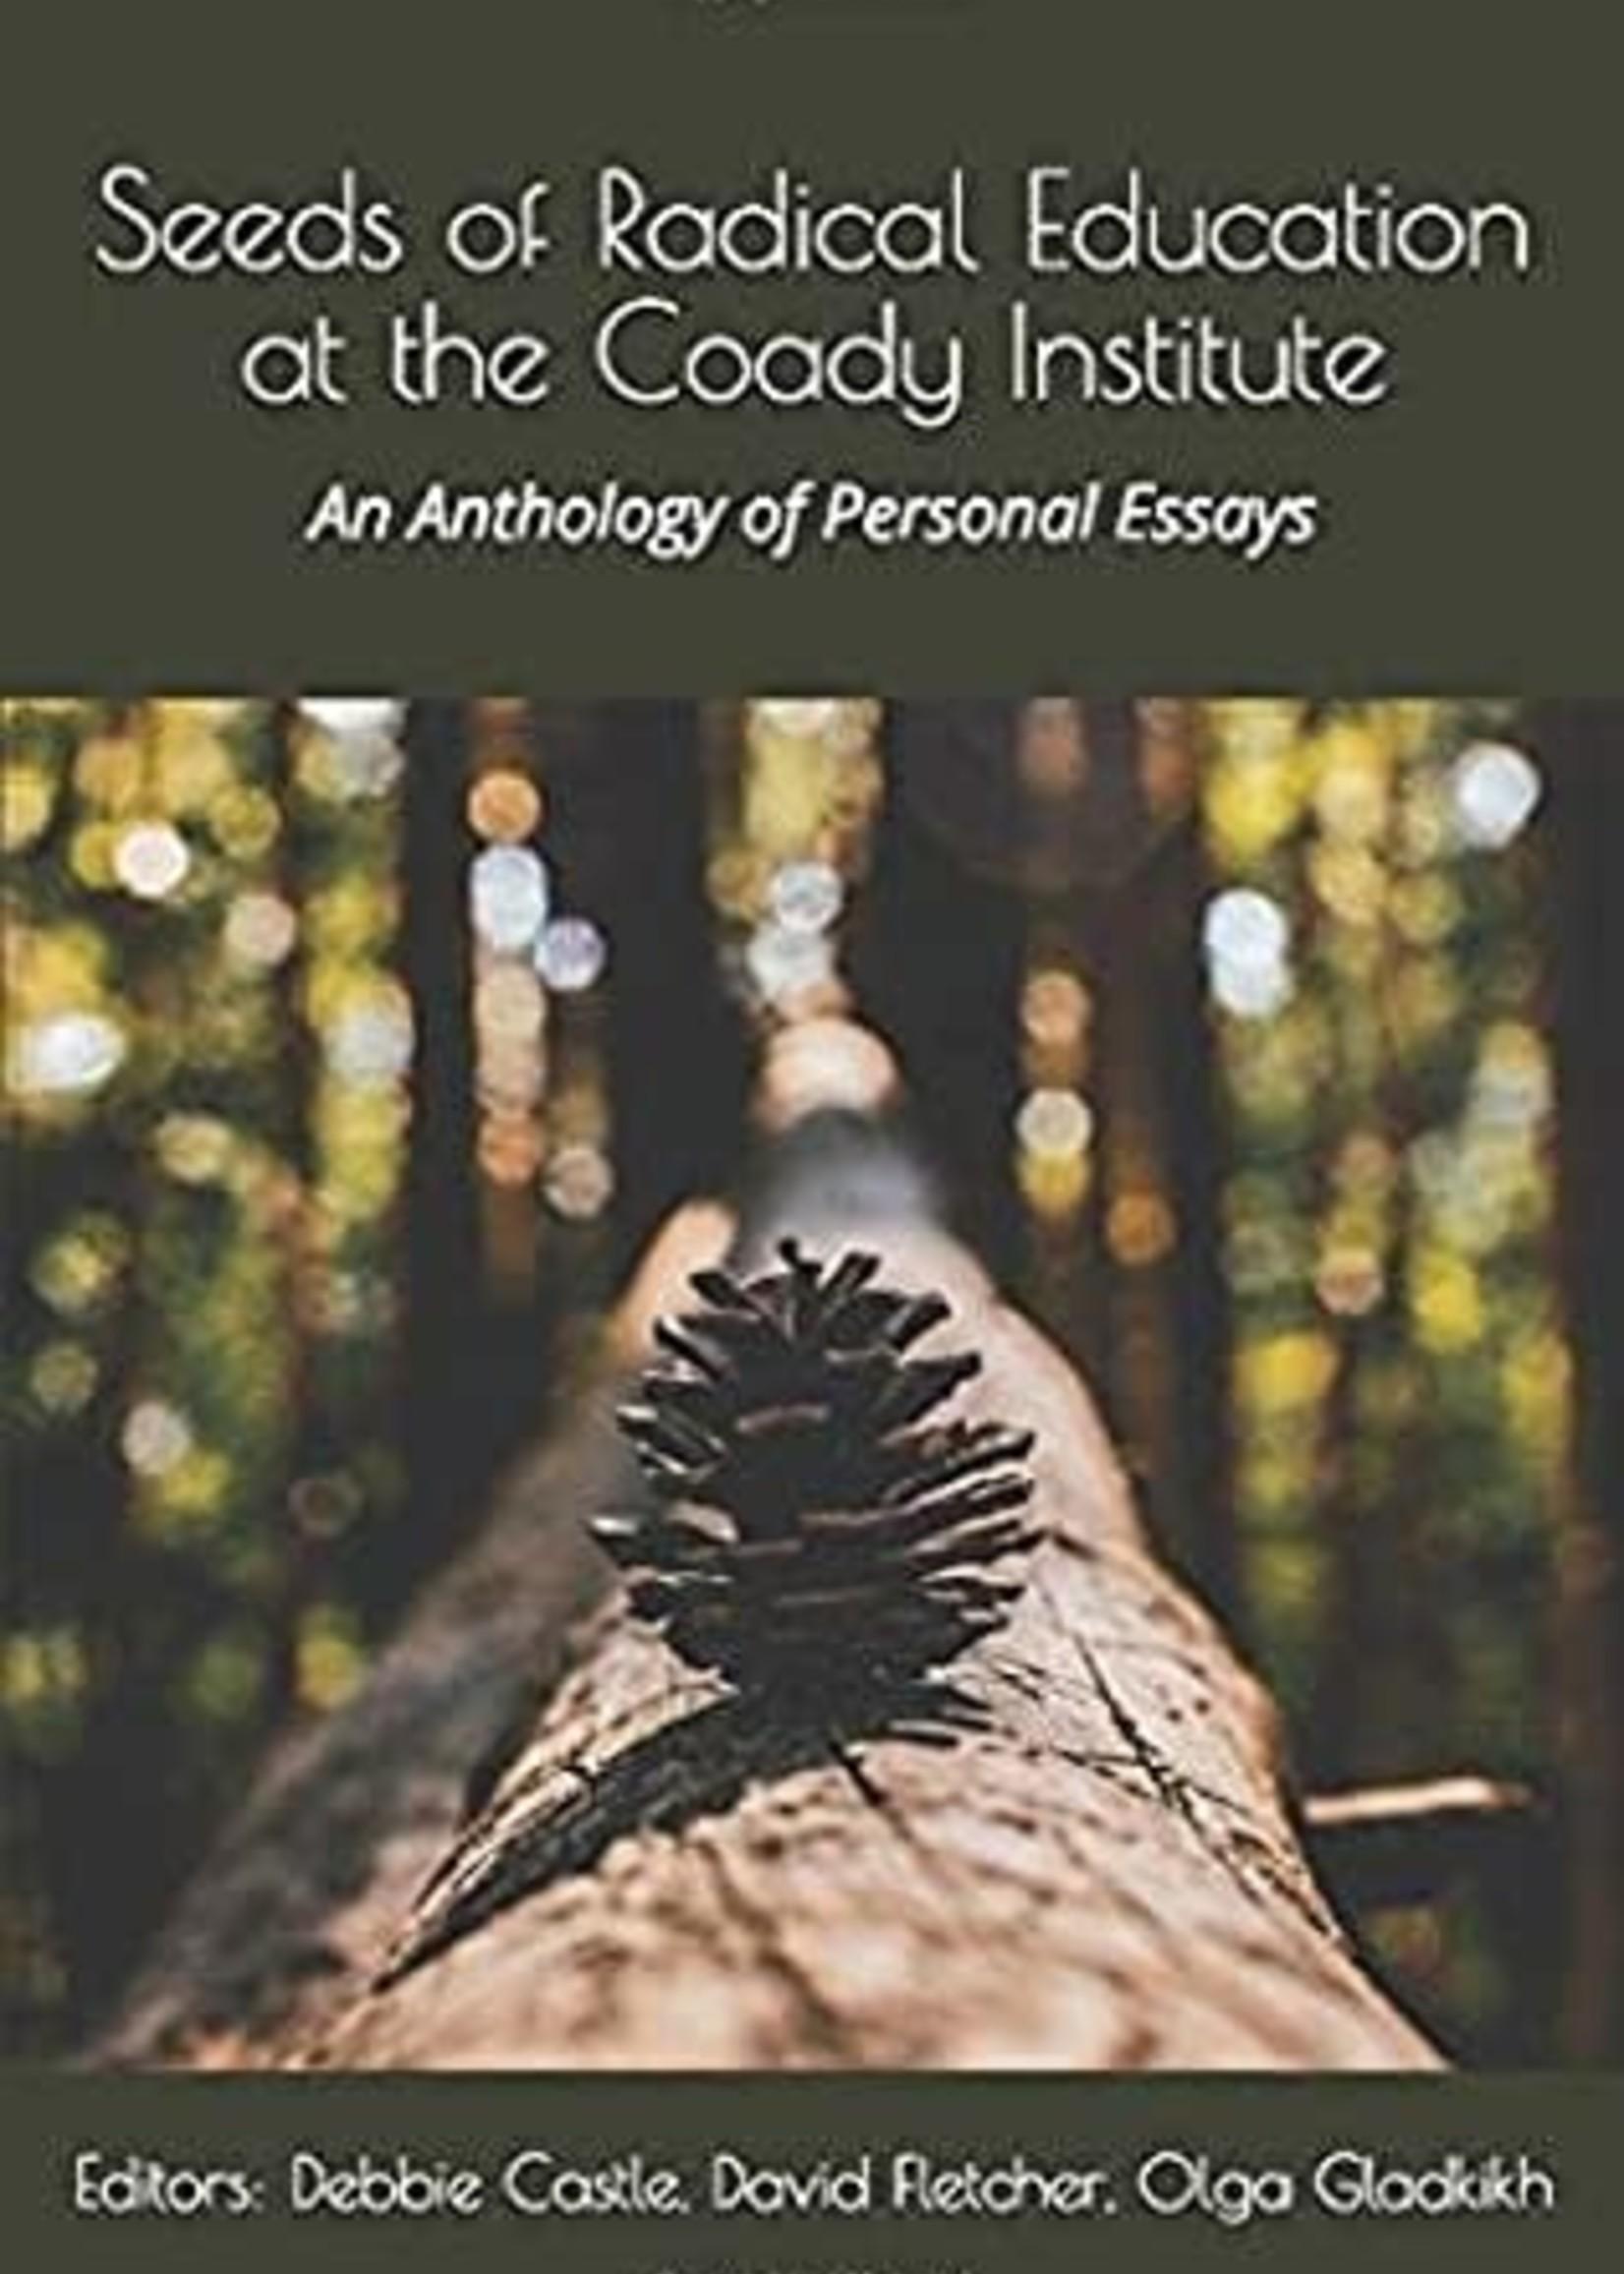 Seeds of Radical Education at the Coady Institute: An anthology of personal essays by Debbie Castle,  David Fletcher,  Olga Gladkikh